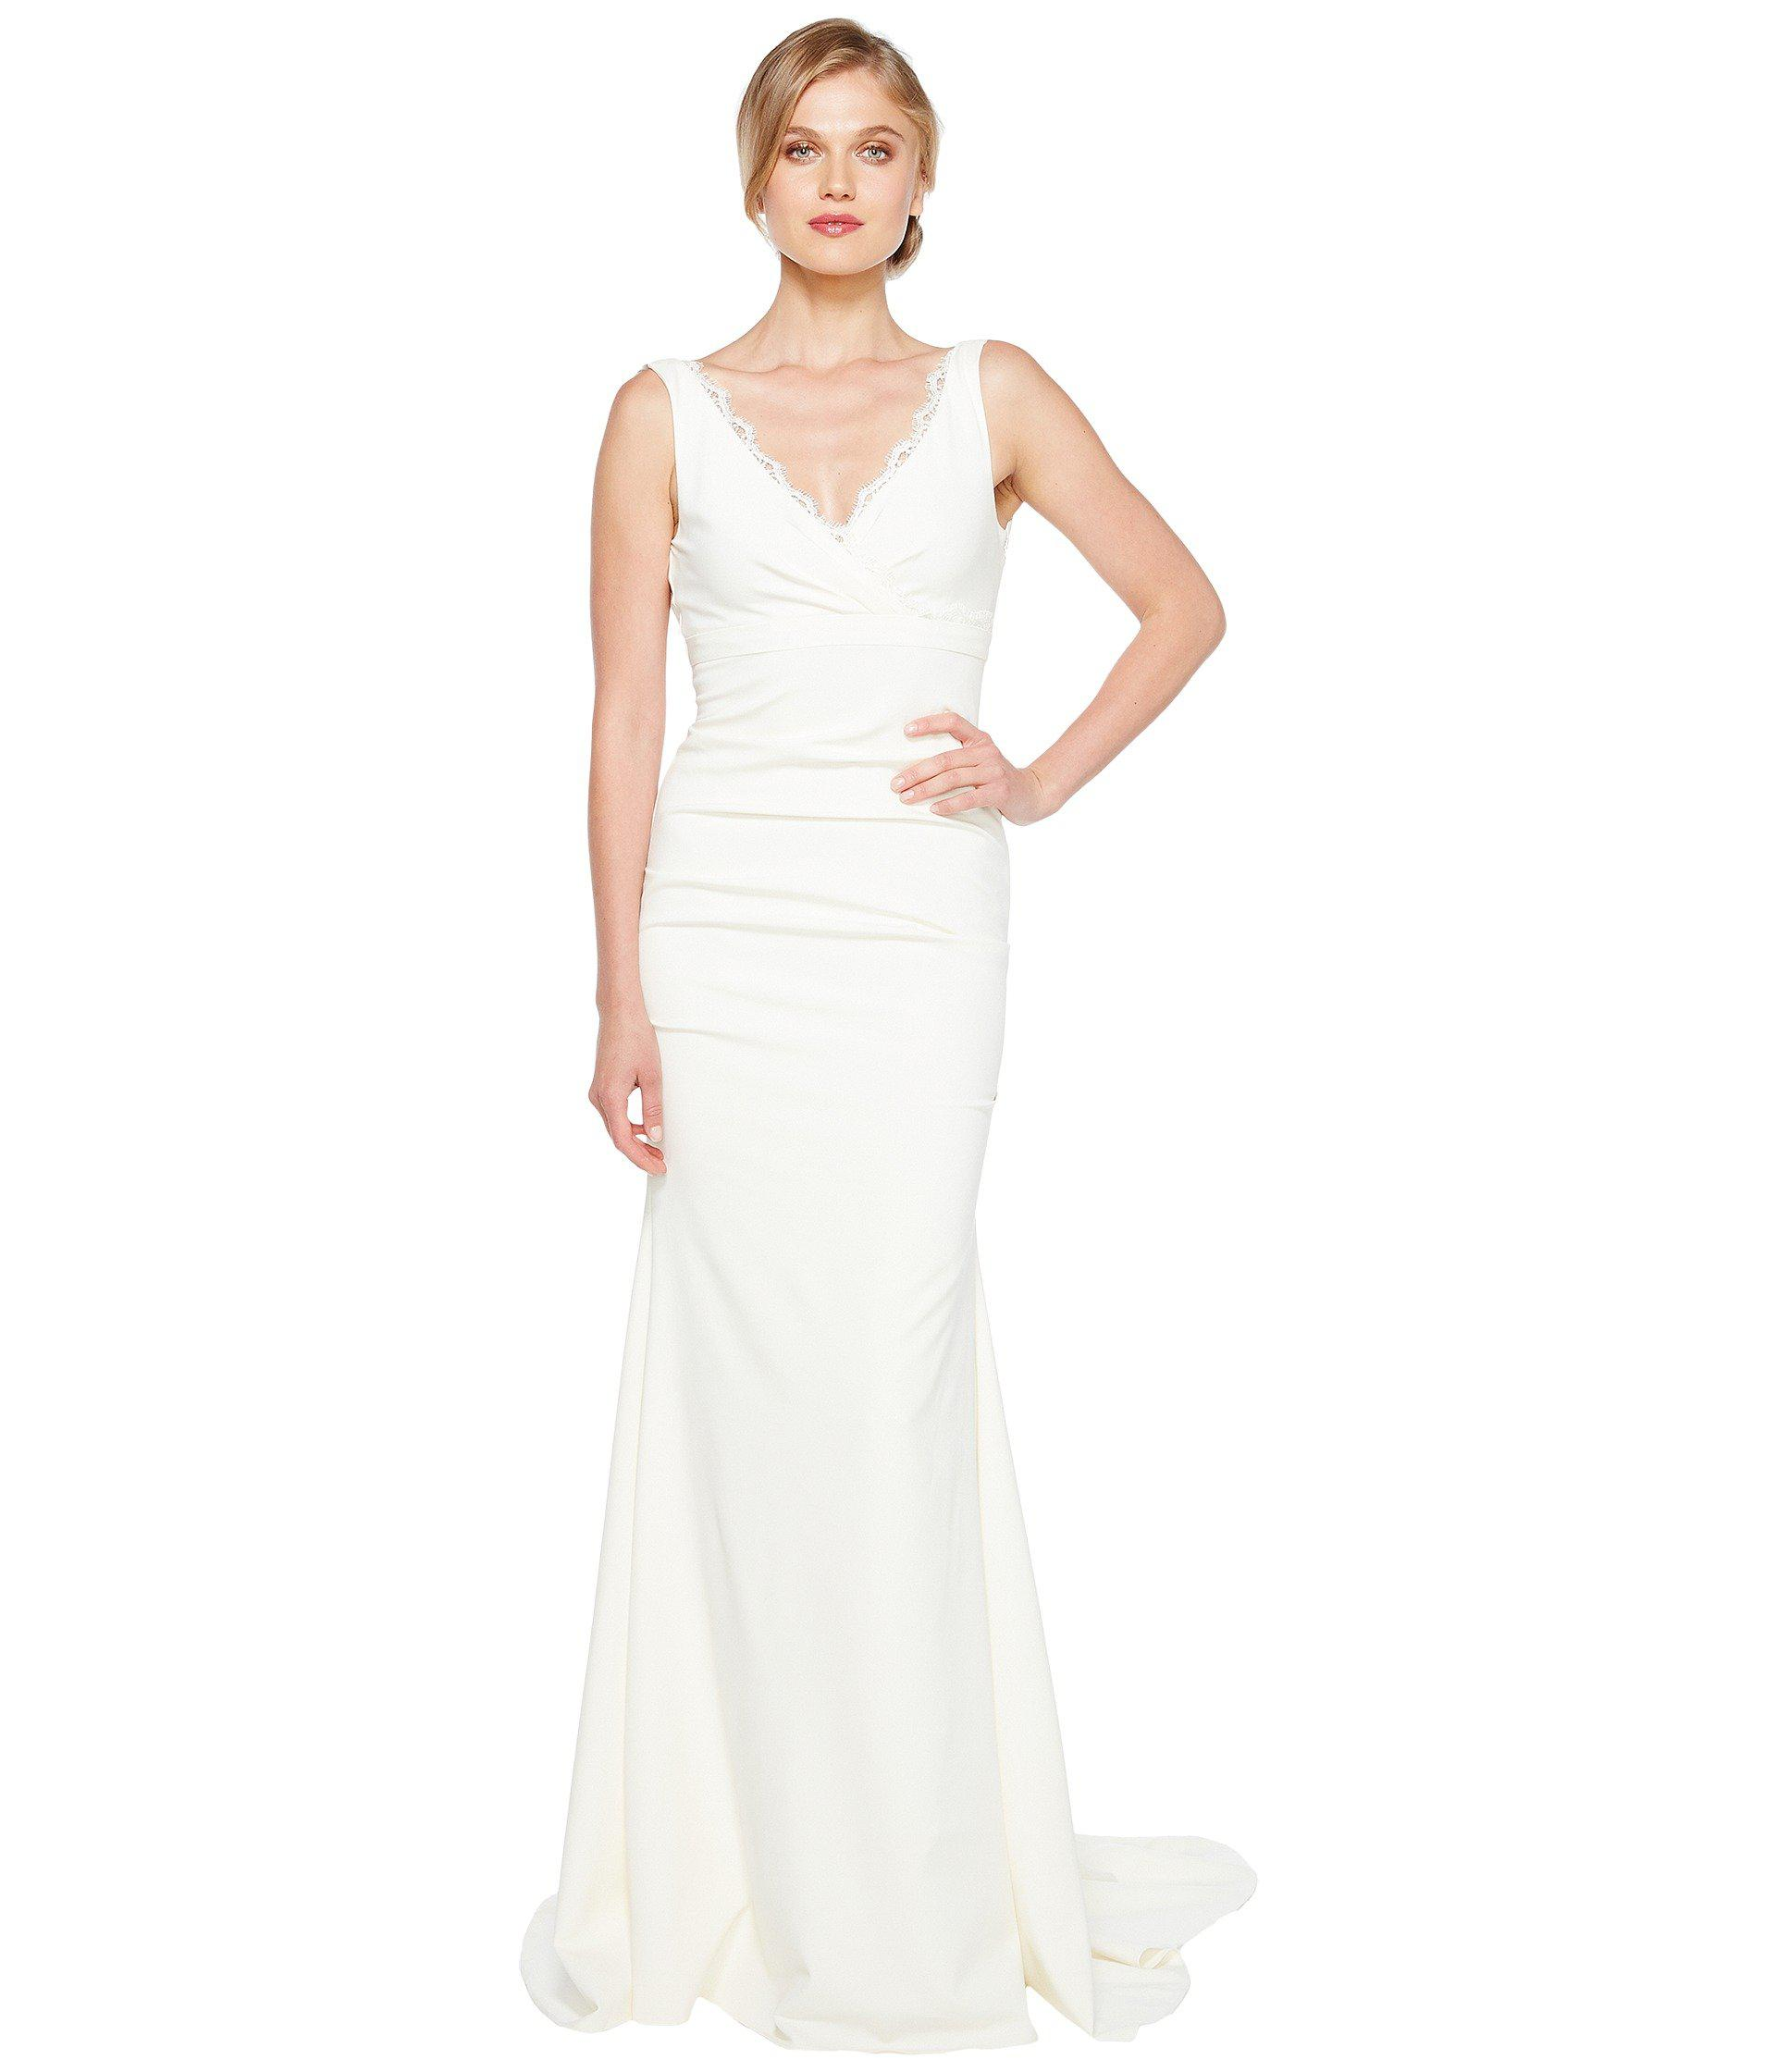 Gallery Nicole Miller Bridal Wedding Dresses: Nicole Miller Nina Bridal Gown (ivory) Women's